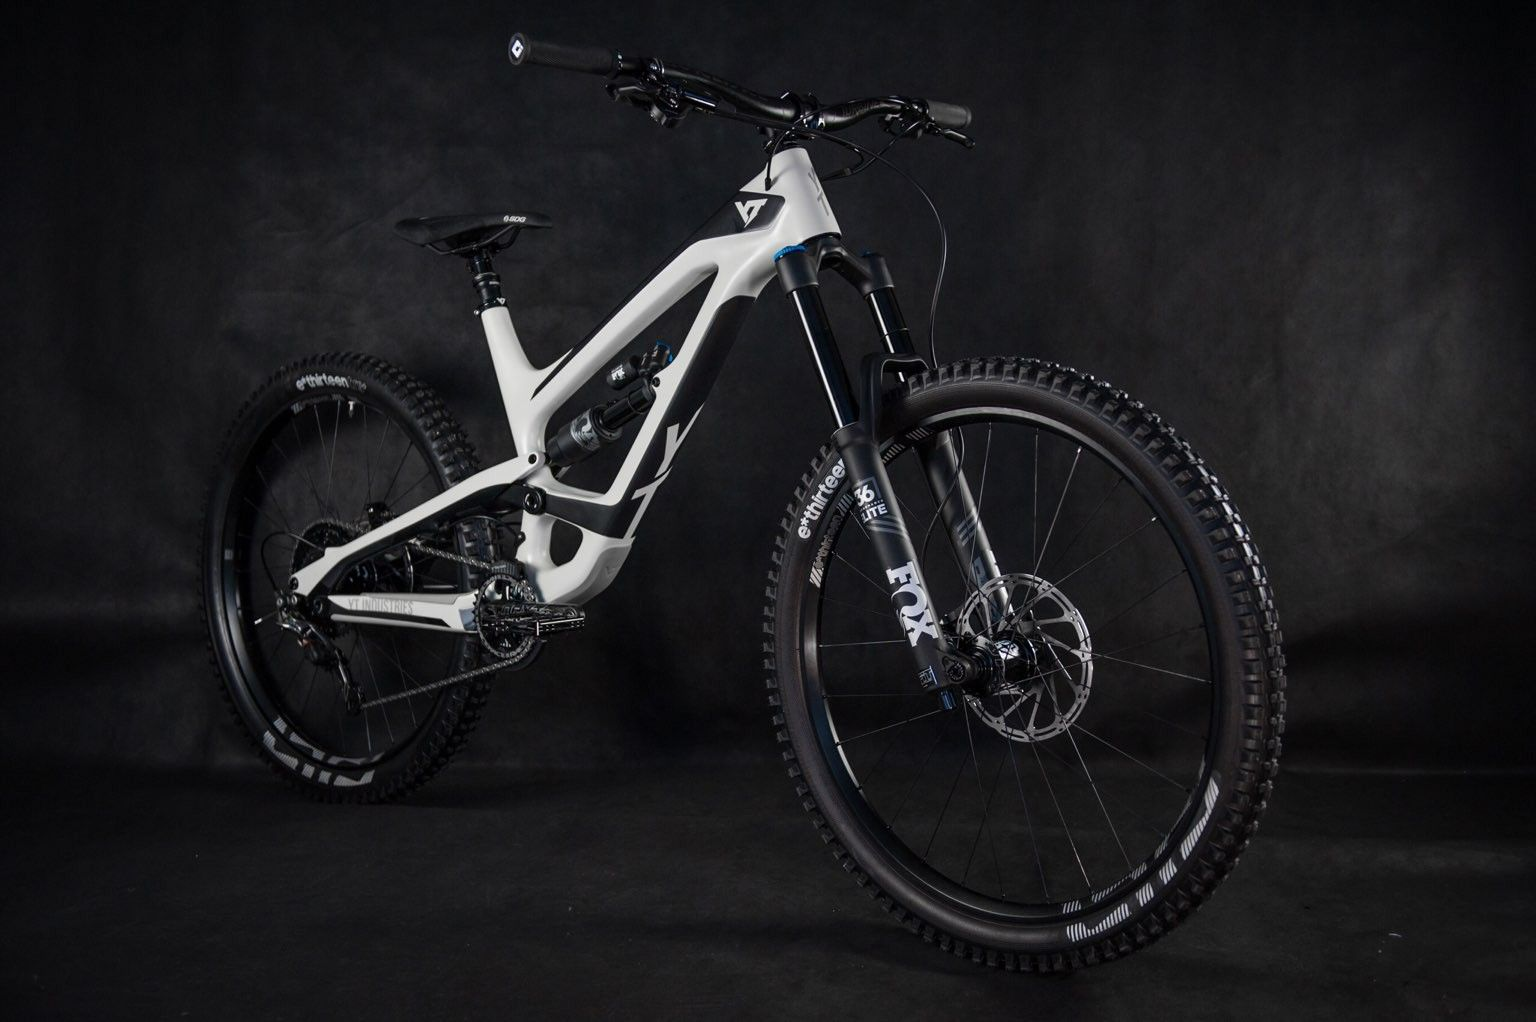 My Ride Yt Industries Capra Cf Pro 2018 The Sickest Bikes On The